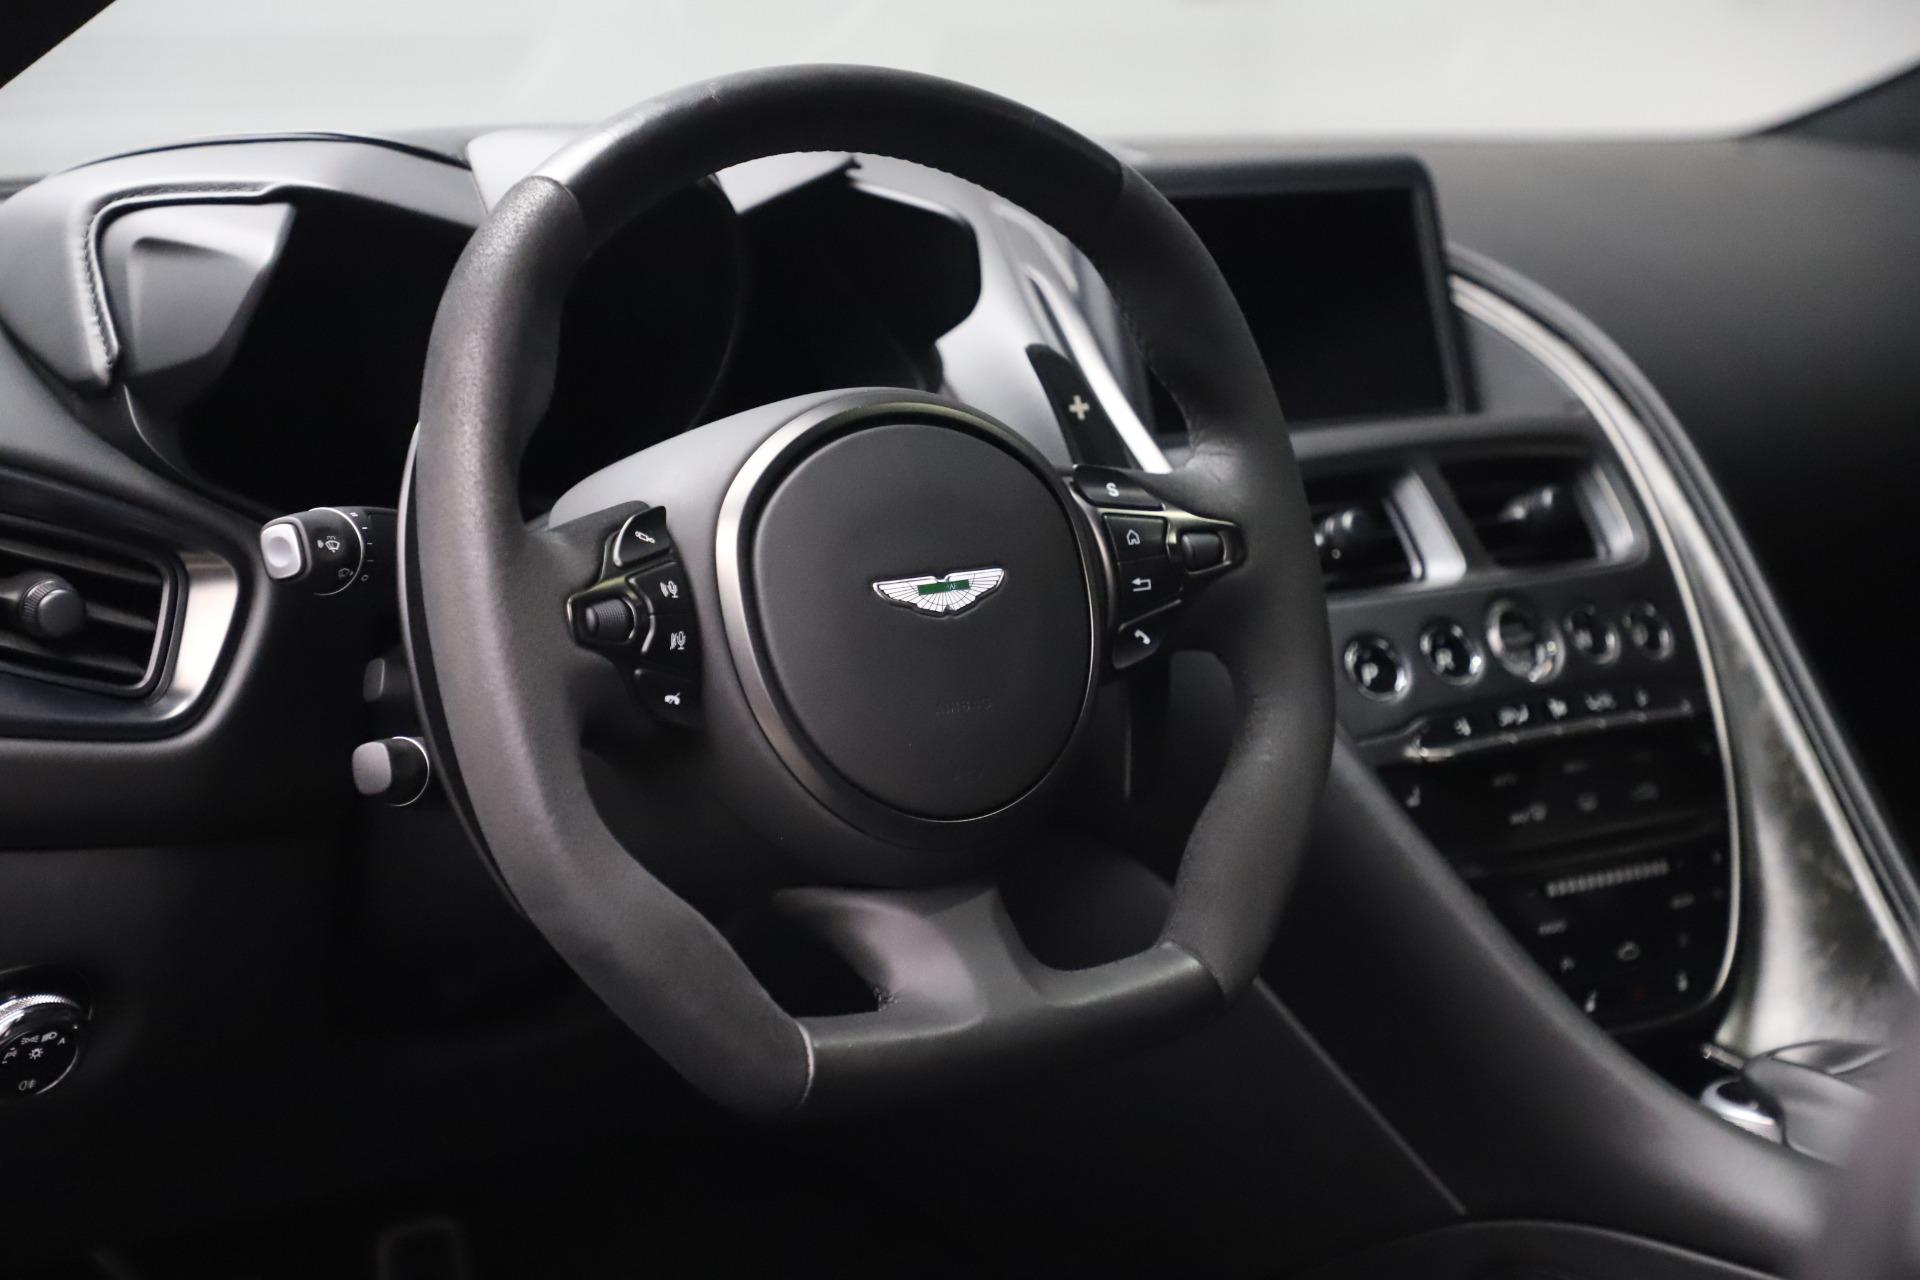 Used 2019 Aston Martin DBS Superleggera Coupe For Sale In Greenwich, CT. Alfa Romeo of Greenwich, A1438B 3570_p16